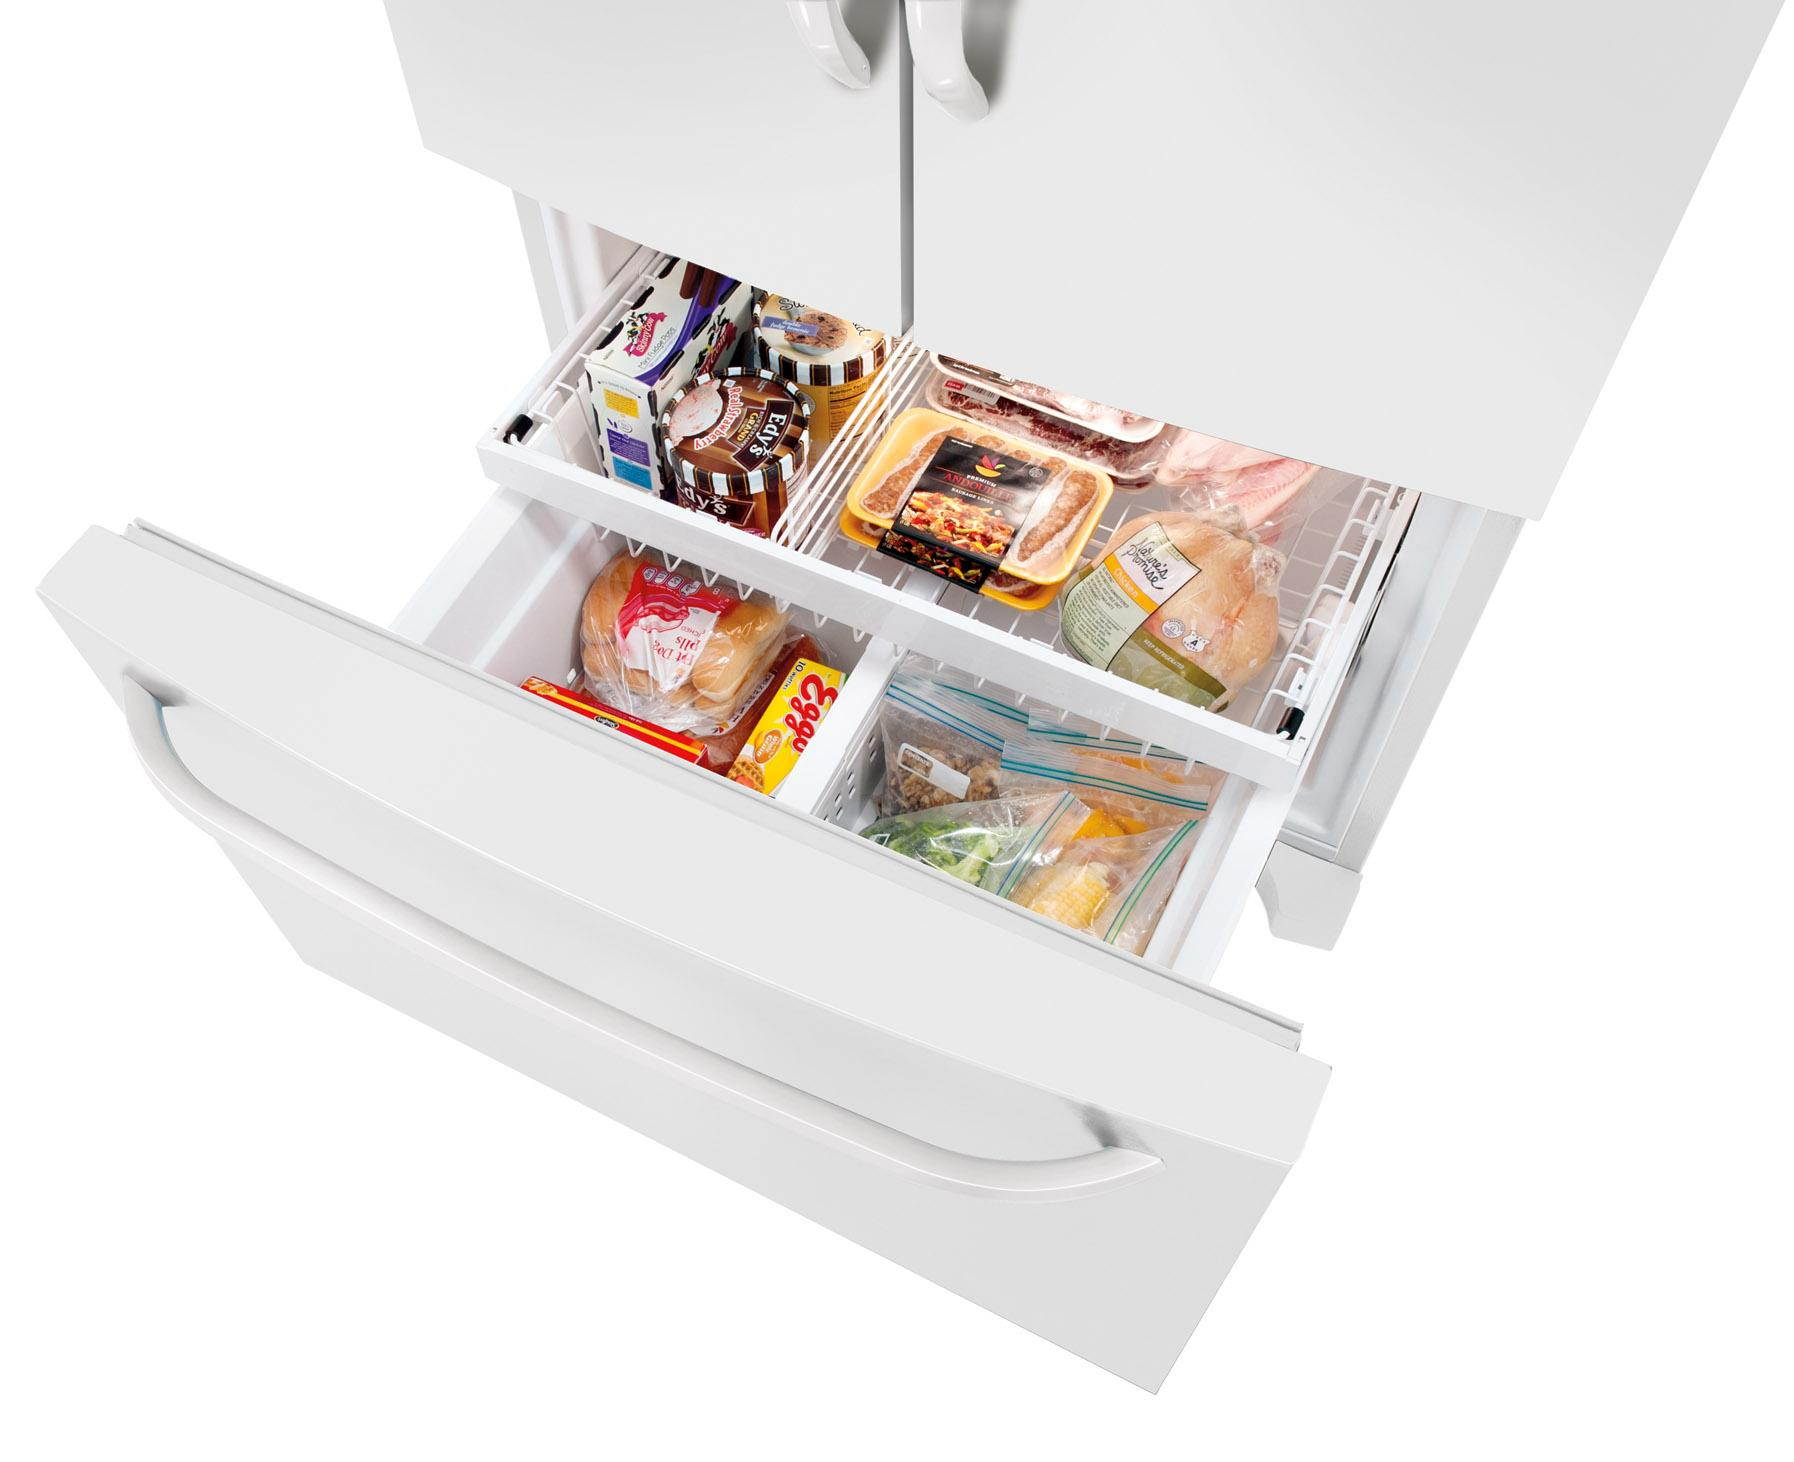 Frigidaire Energy Star 26 7 Cu Ft French Door Refrigerator With Adjustable Interior Storage